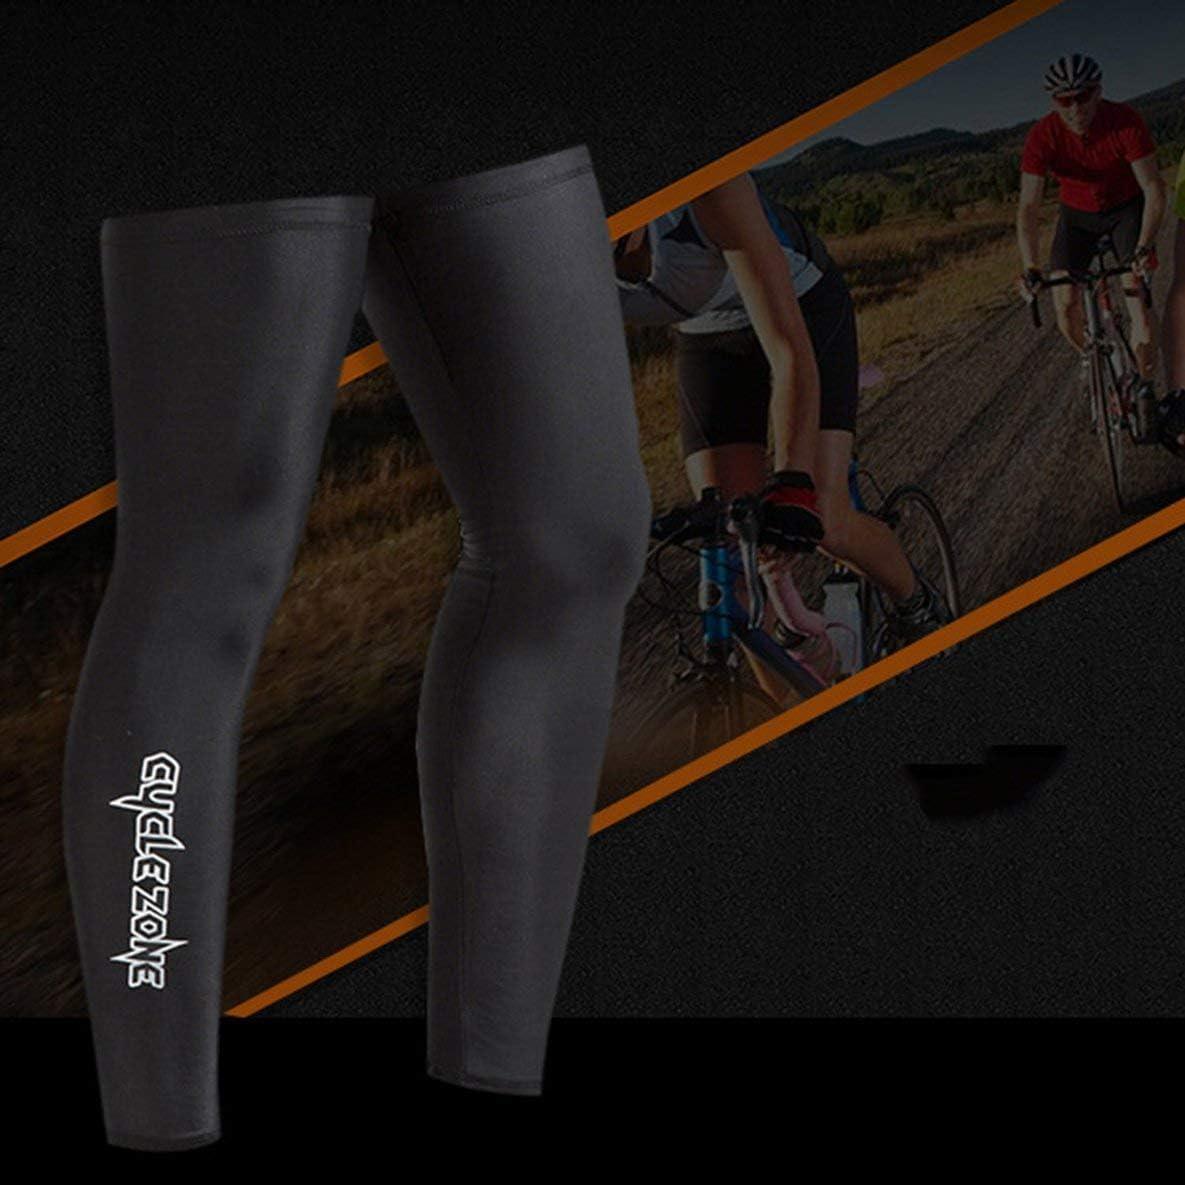 Protection UV ext/érieure Jambe V/élo V/élo Bicyclette Riding Bras Manches Hommes Femmes Running Fitness Bras Jambi/ère Warmer Noir XL